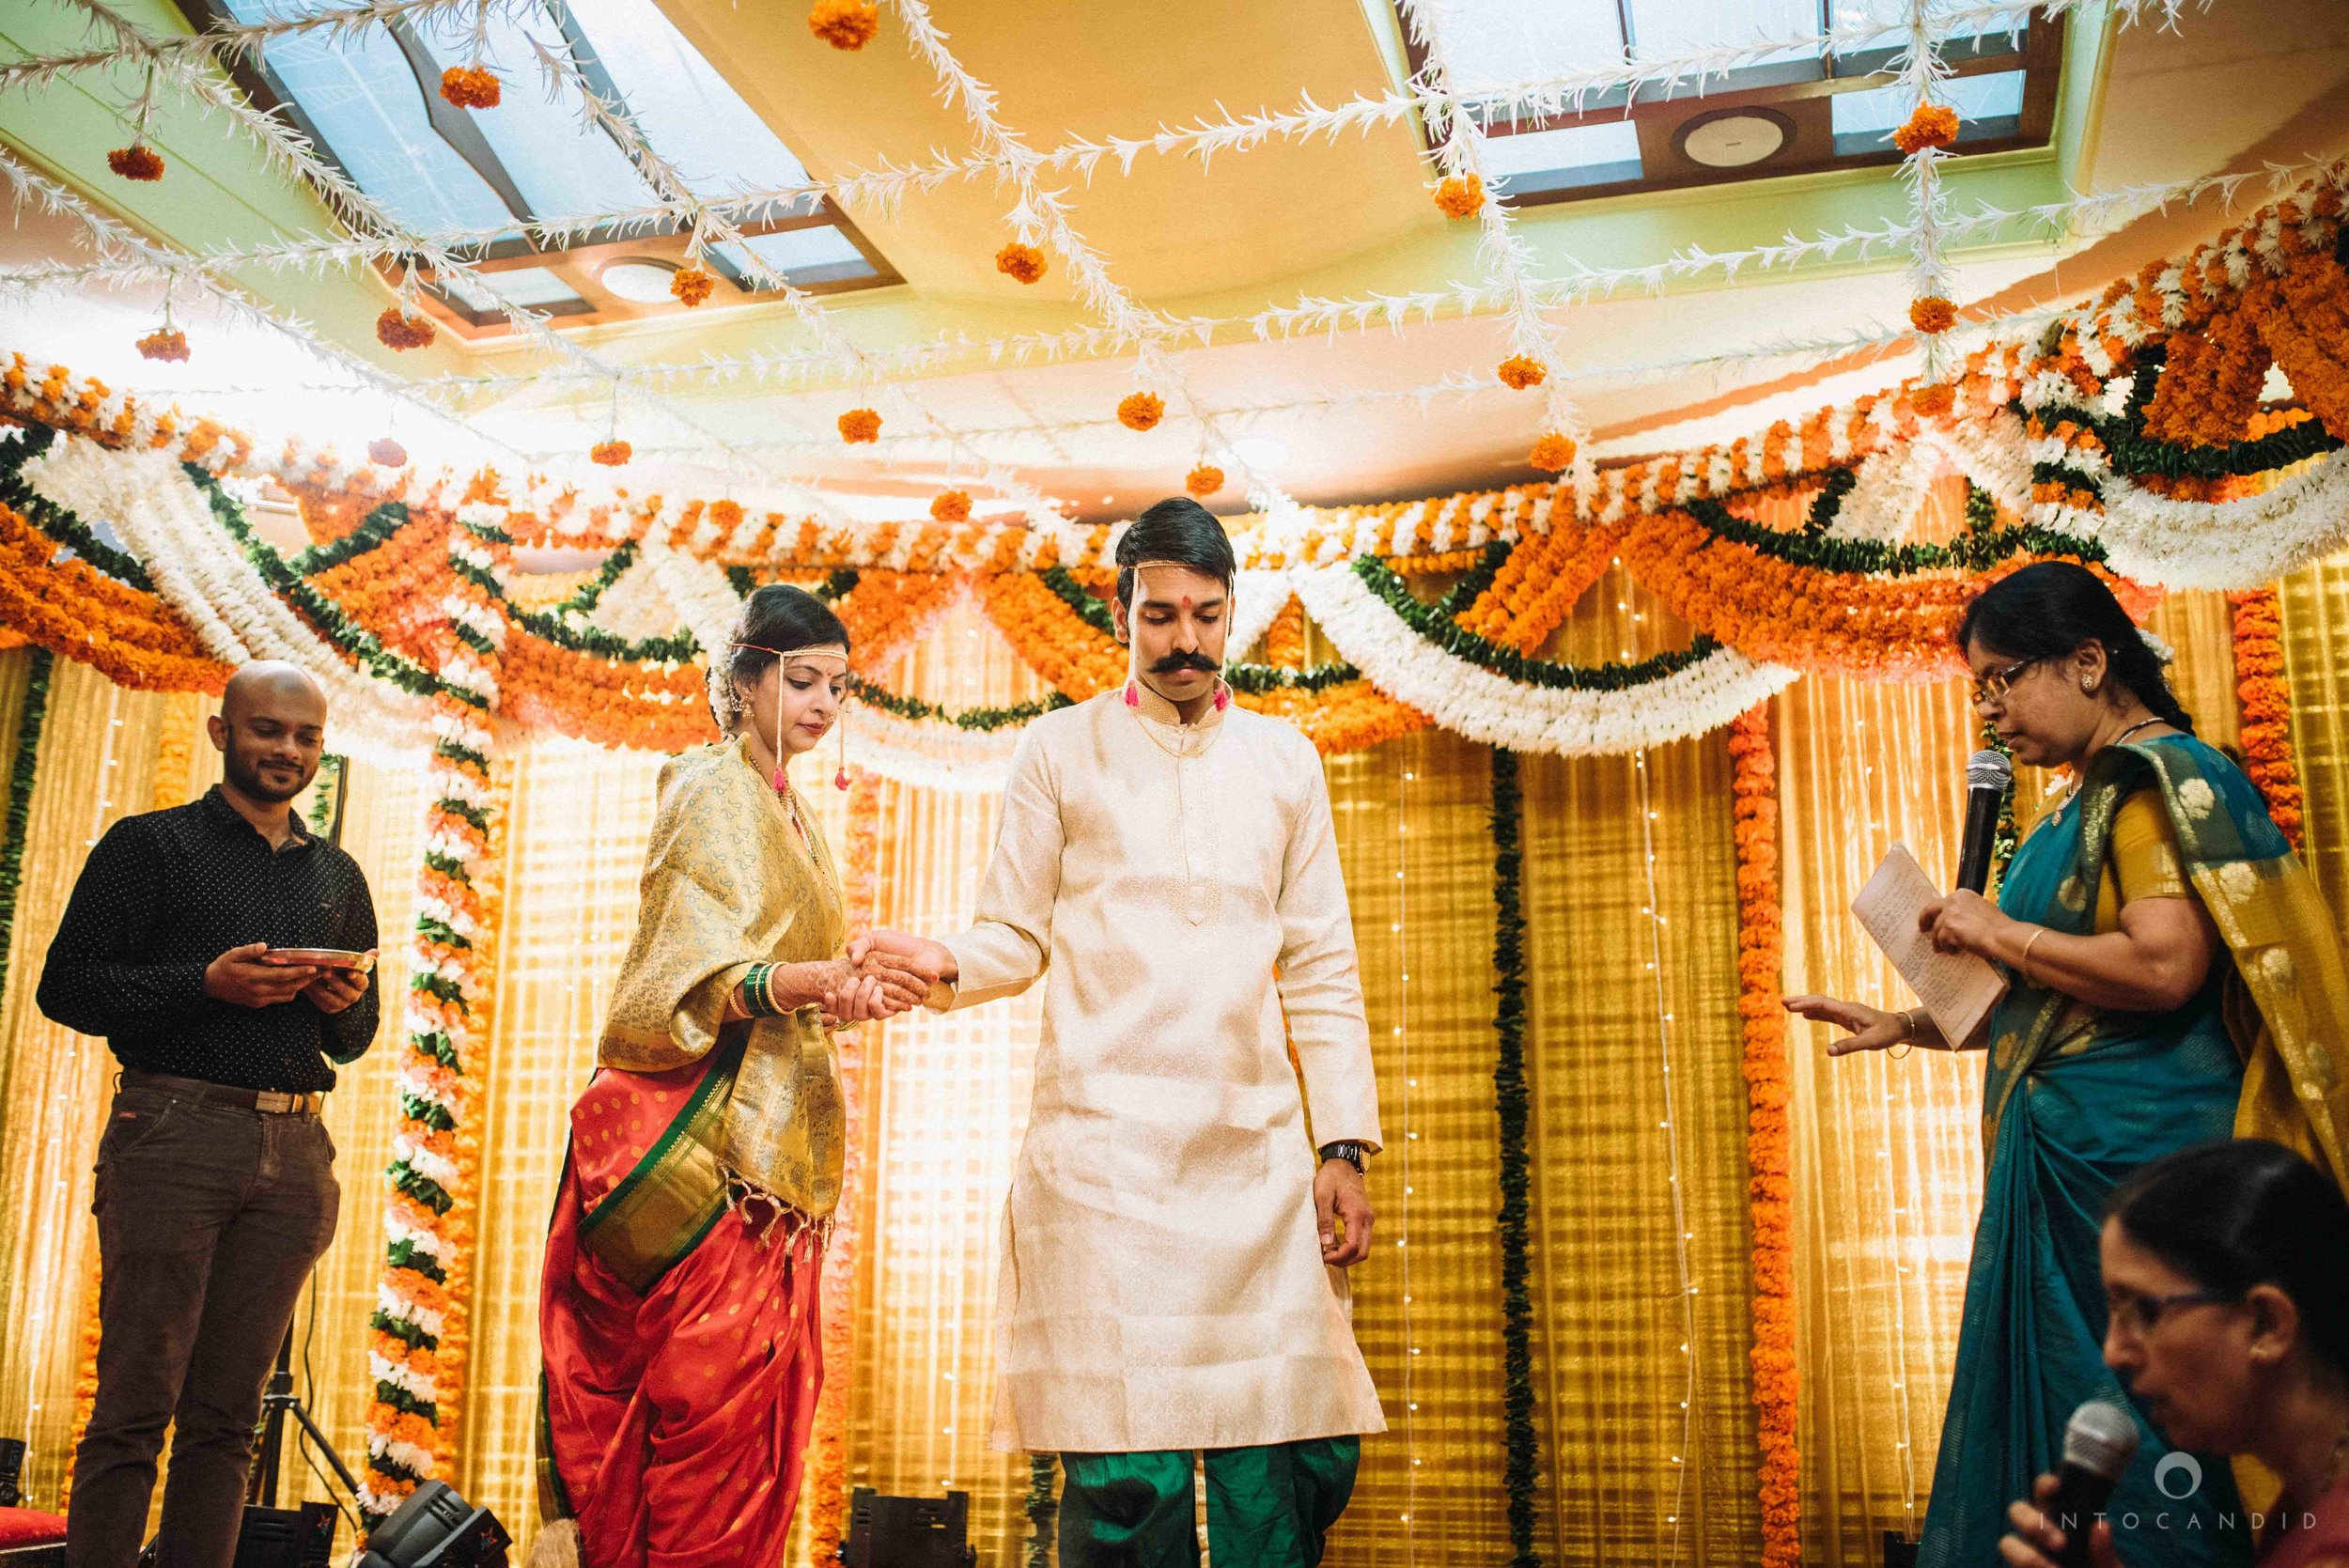 Bangalore_Wedding_Photographer_Indian_Wedding_Photography_68.jpg